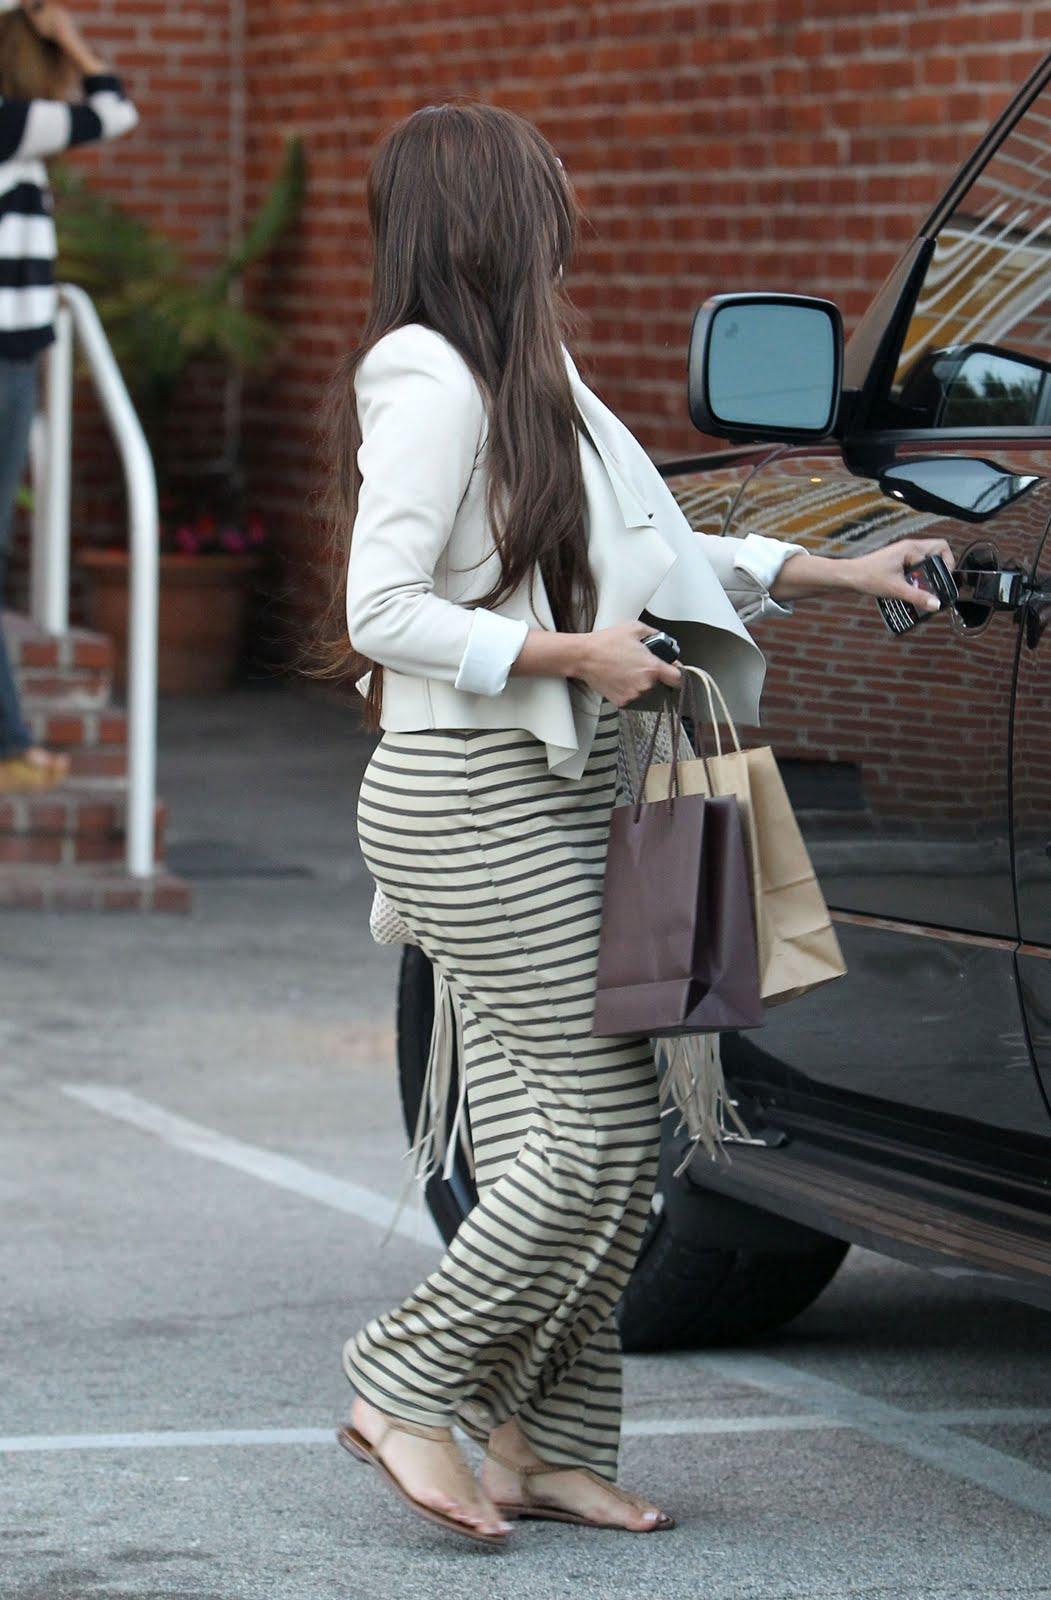 http://3.bp.blogspot.com/-hA1JQmBWVOA/Tg6eFQSp8TI/AAAAAAAAOQw/LEC_OuAEREU/s1600/Kim-Kardashian-5.jpg